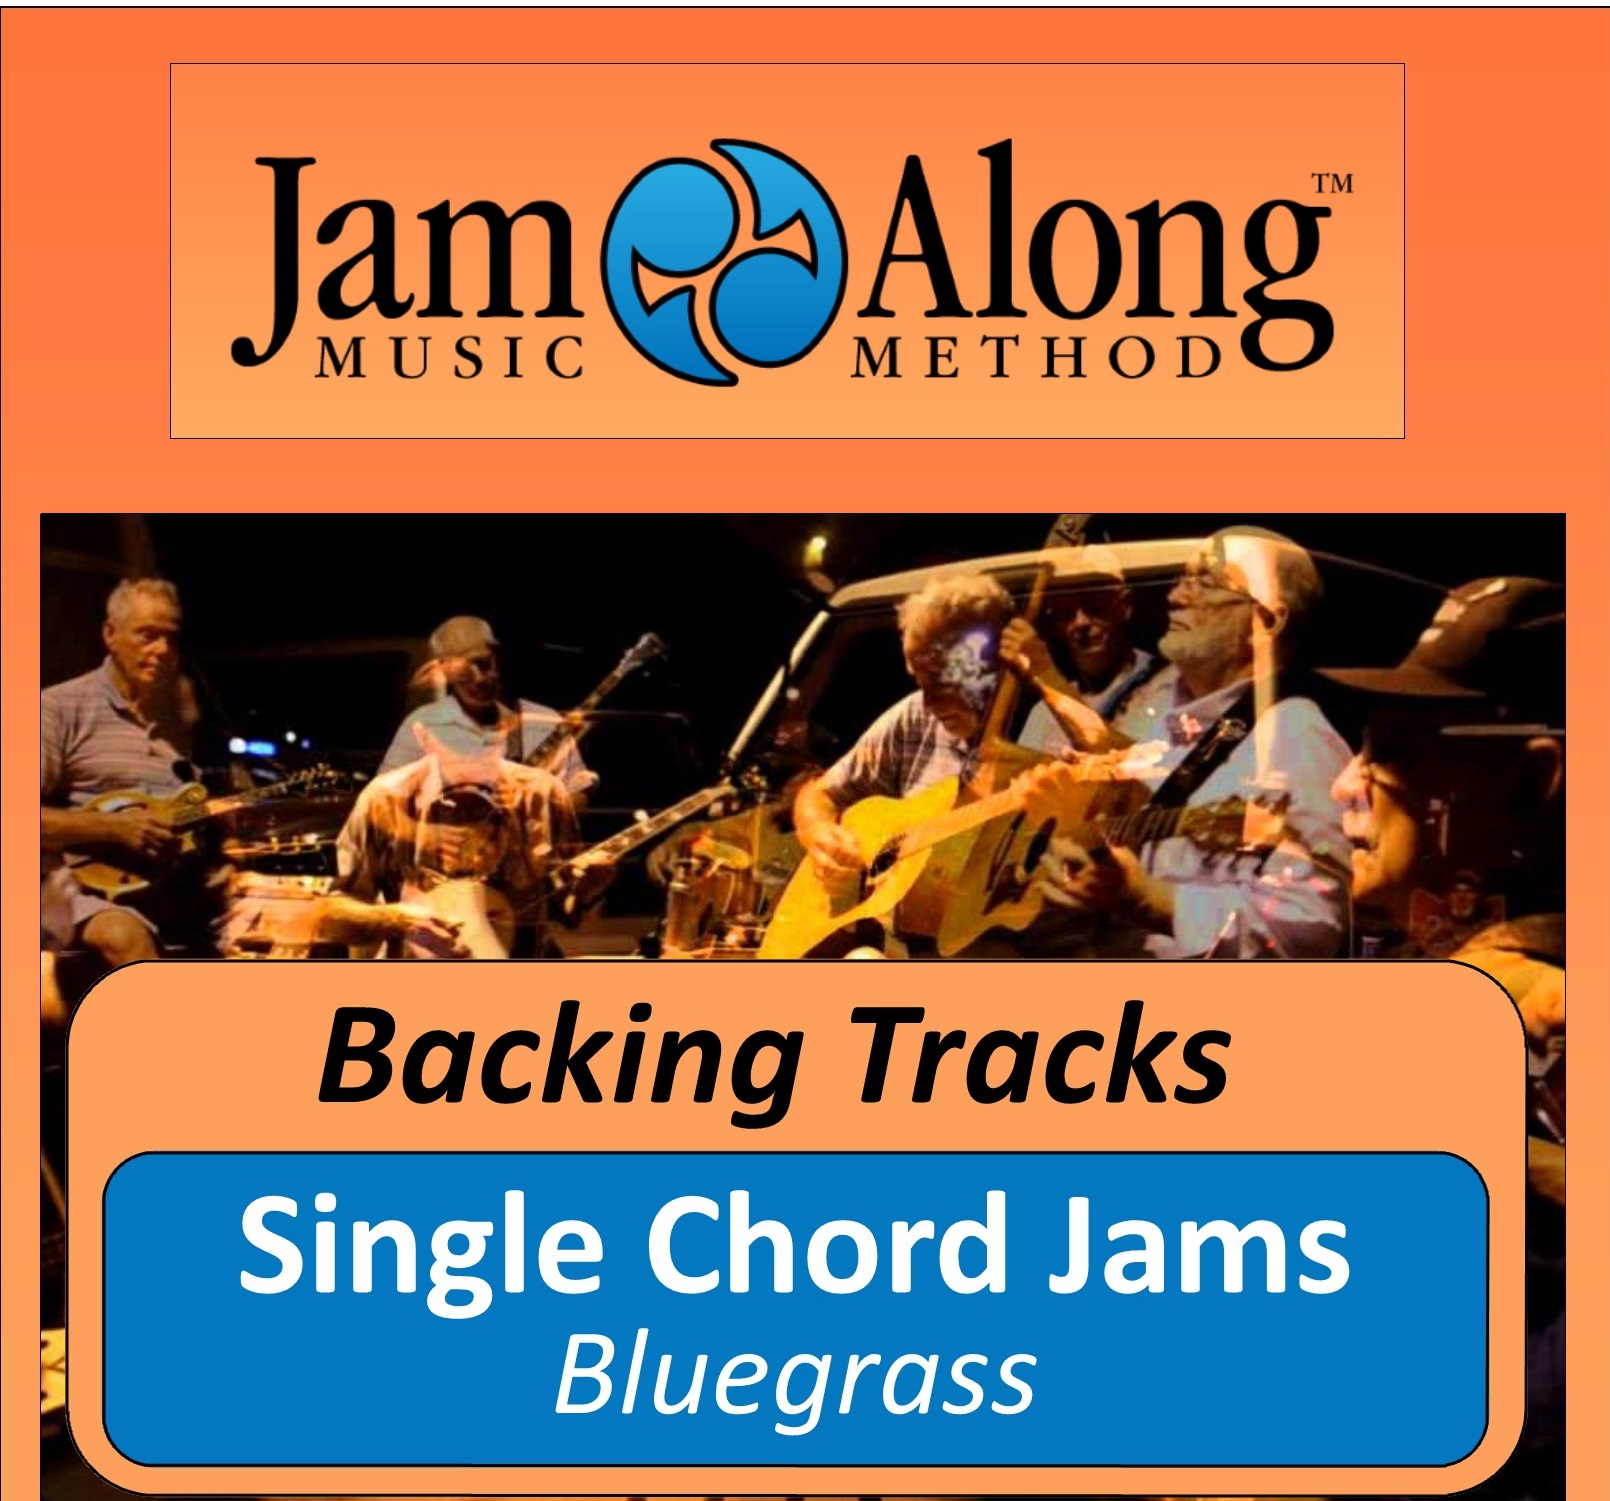 Single Chord Jams Bluegrass Backing Tracks Jamalong Music Method